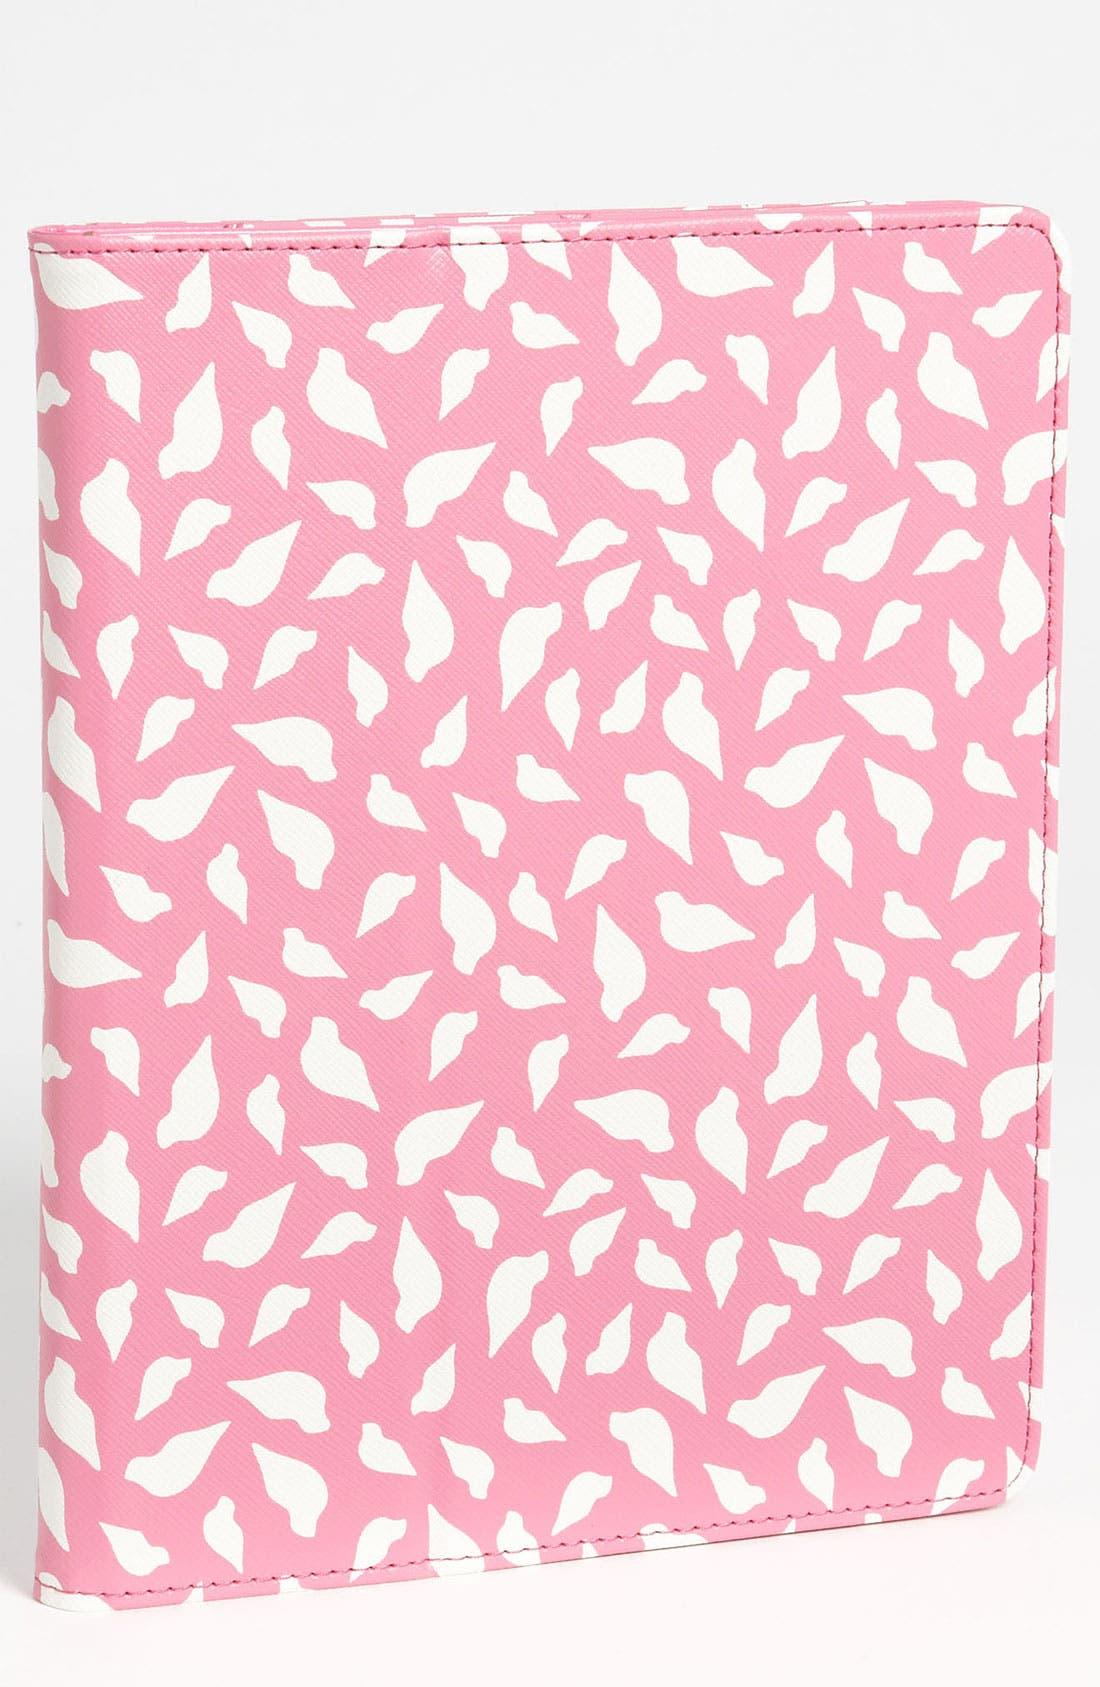 Main Image - Diane von Furstenberg 'Printed Lips' iPad Cover